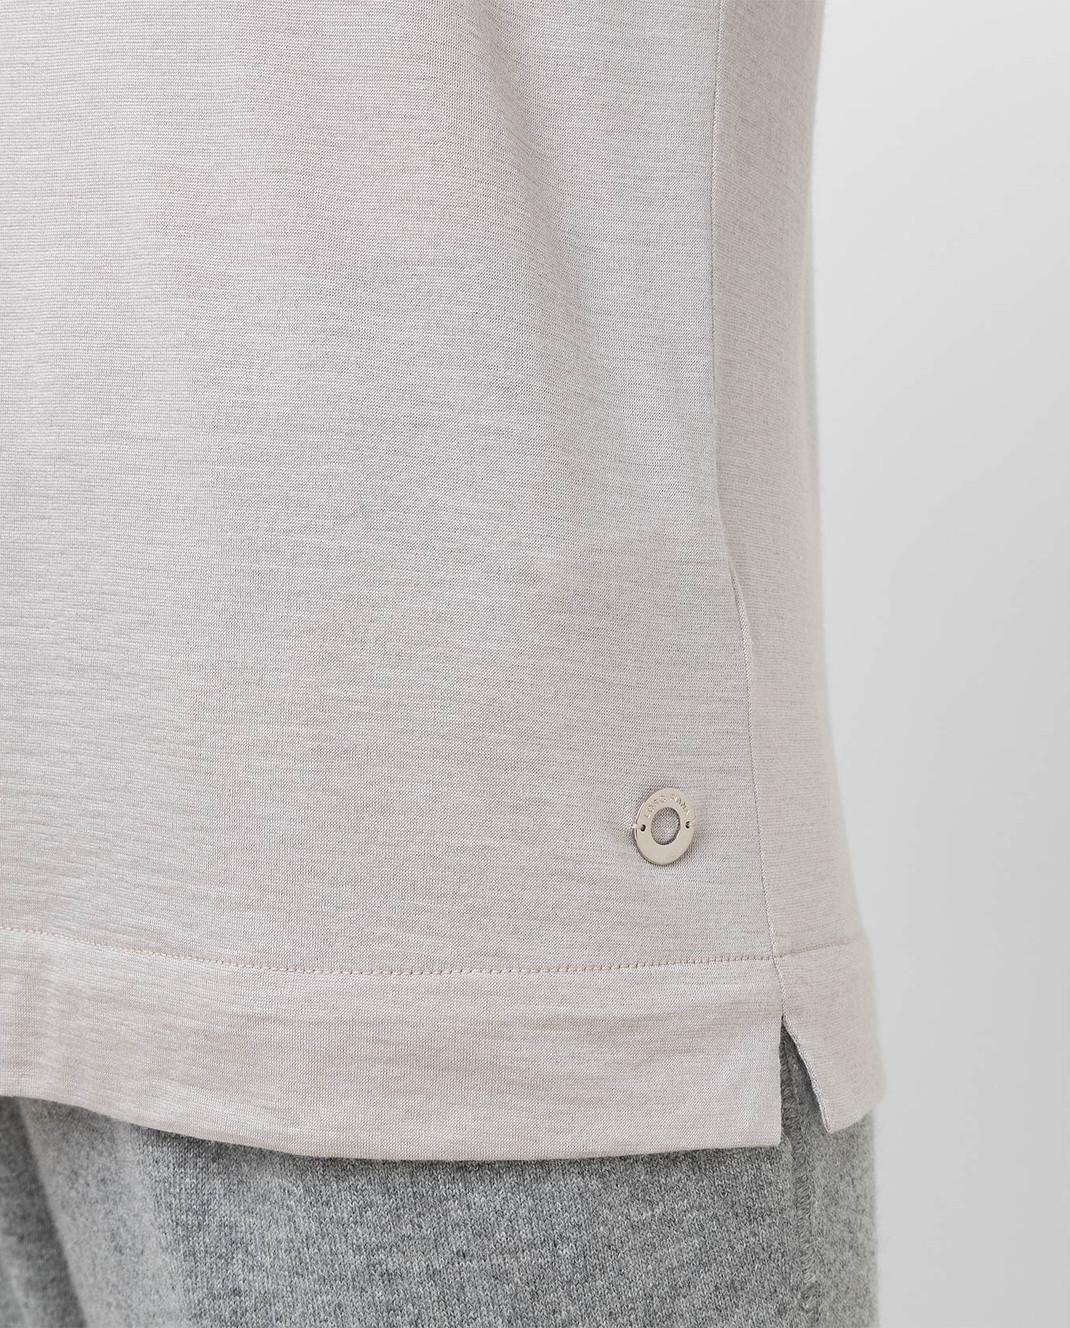 Loro Piana Серый джемпер из кашемира и шелка F2FAE5730 изображение 5